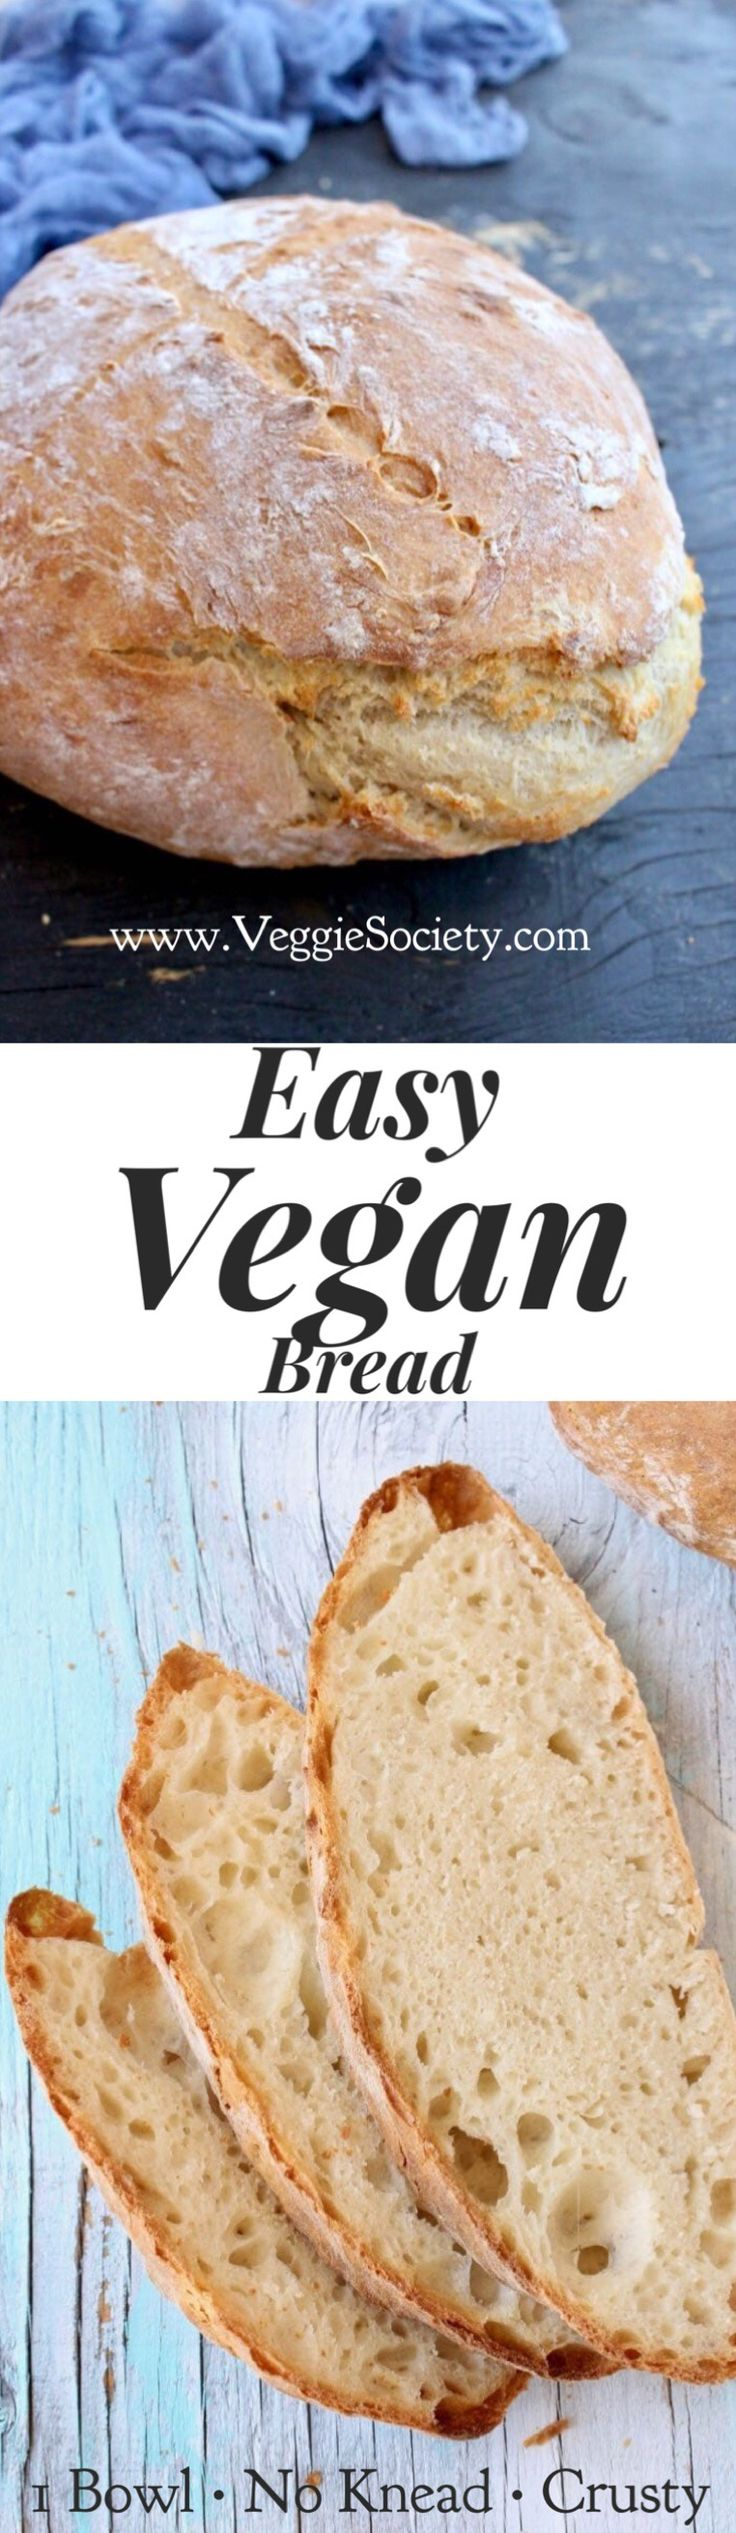 Easy Vegan Bread Recipe. Crusty, No Knead, 3 Ingredients Only. Simply the Best | VeggieSociety.com @VeggieSociety